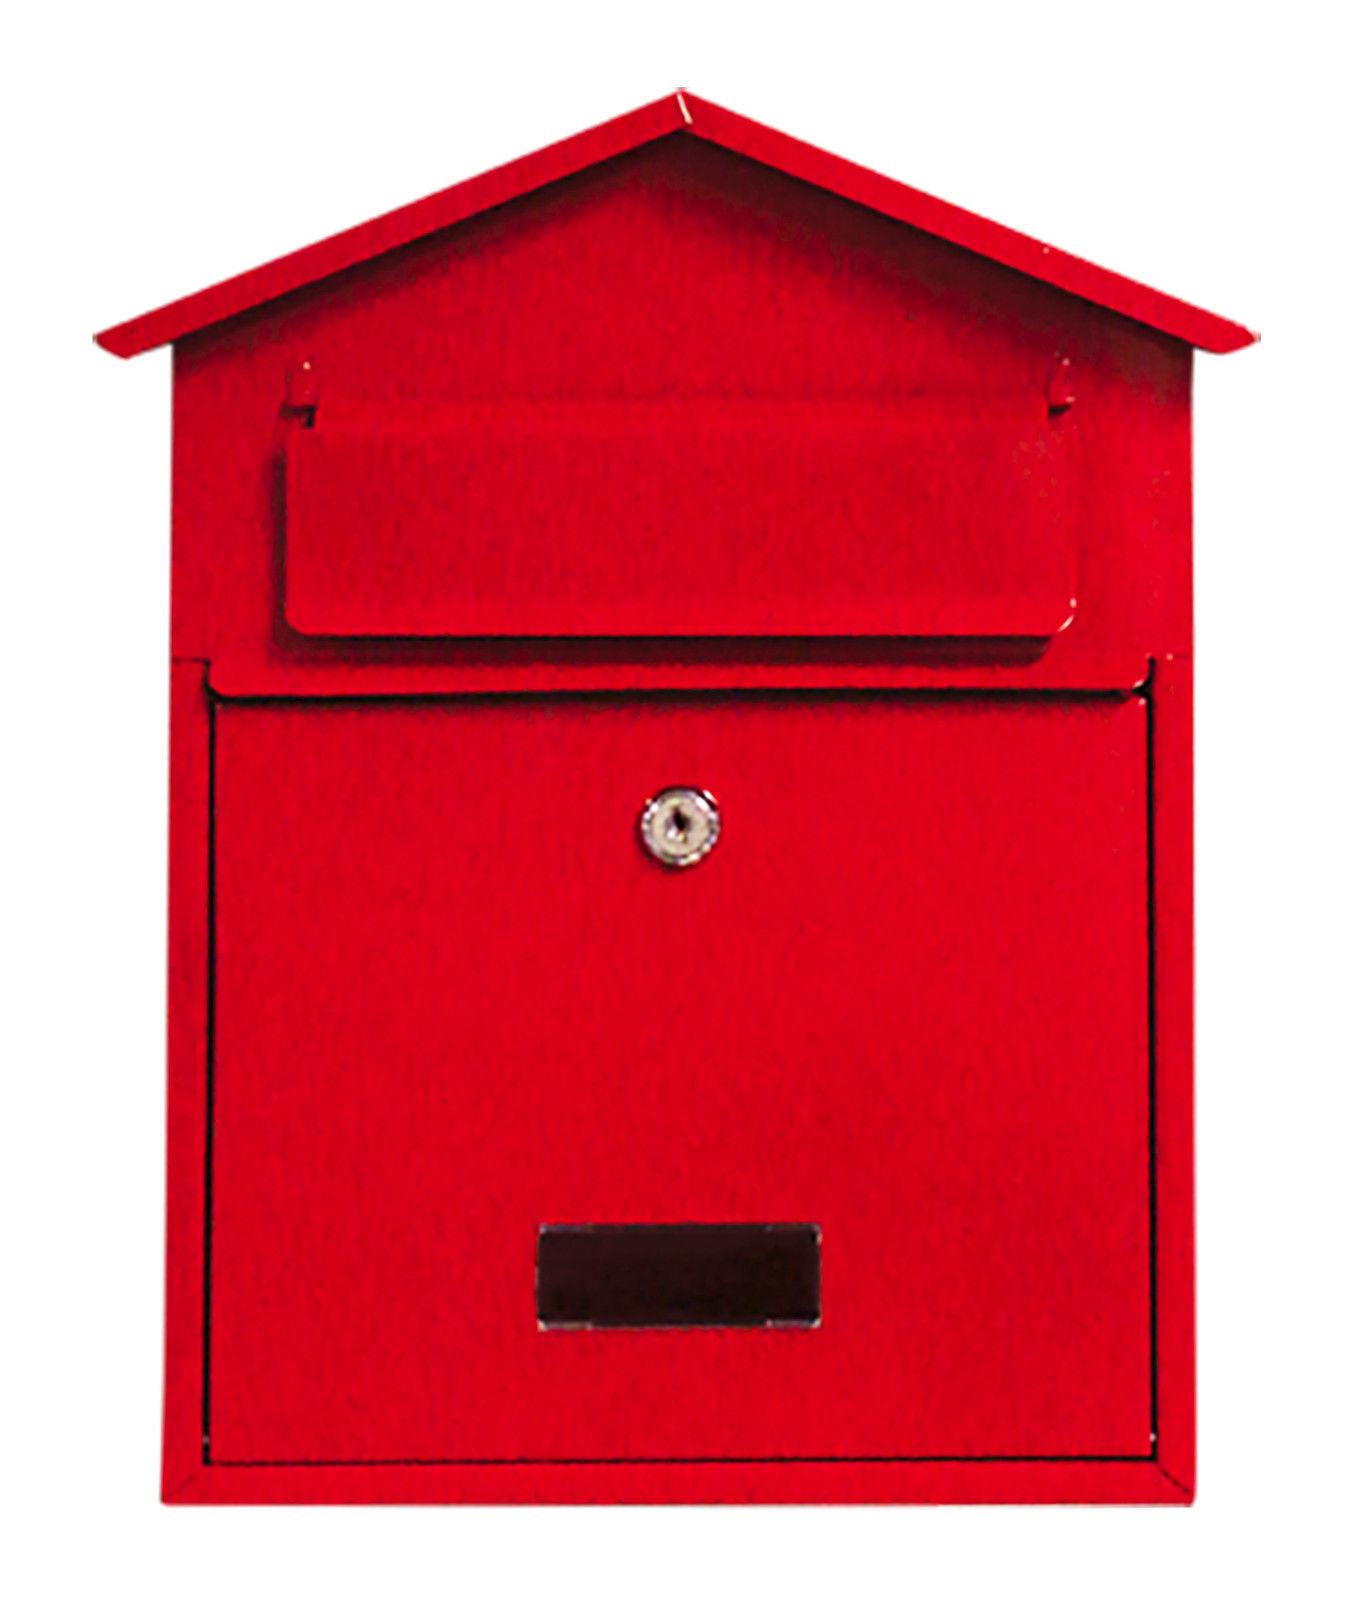 Bird Houses Red Post Box Birdhouse S L1600 Lockable Steel Wall ...